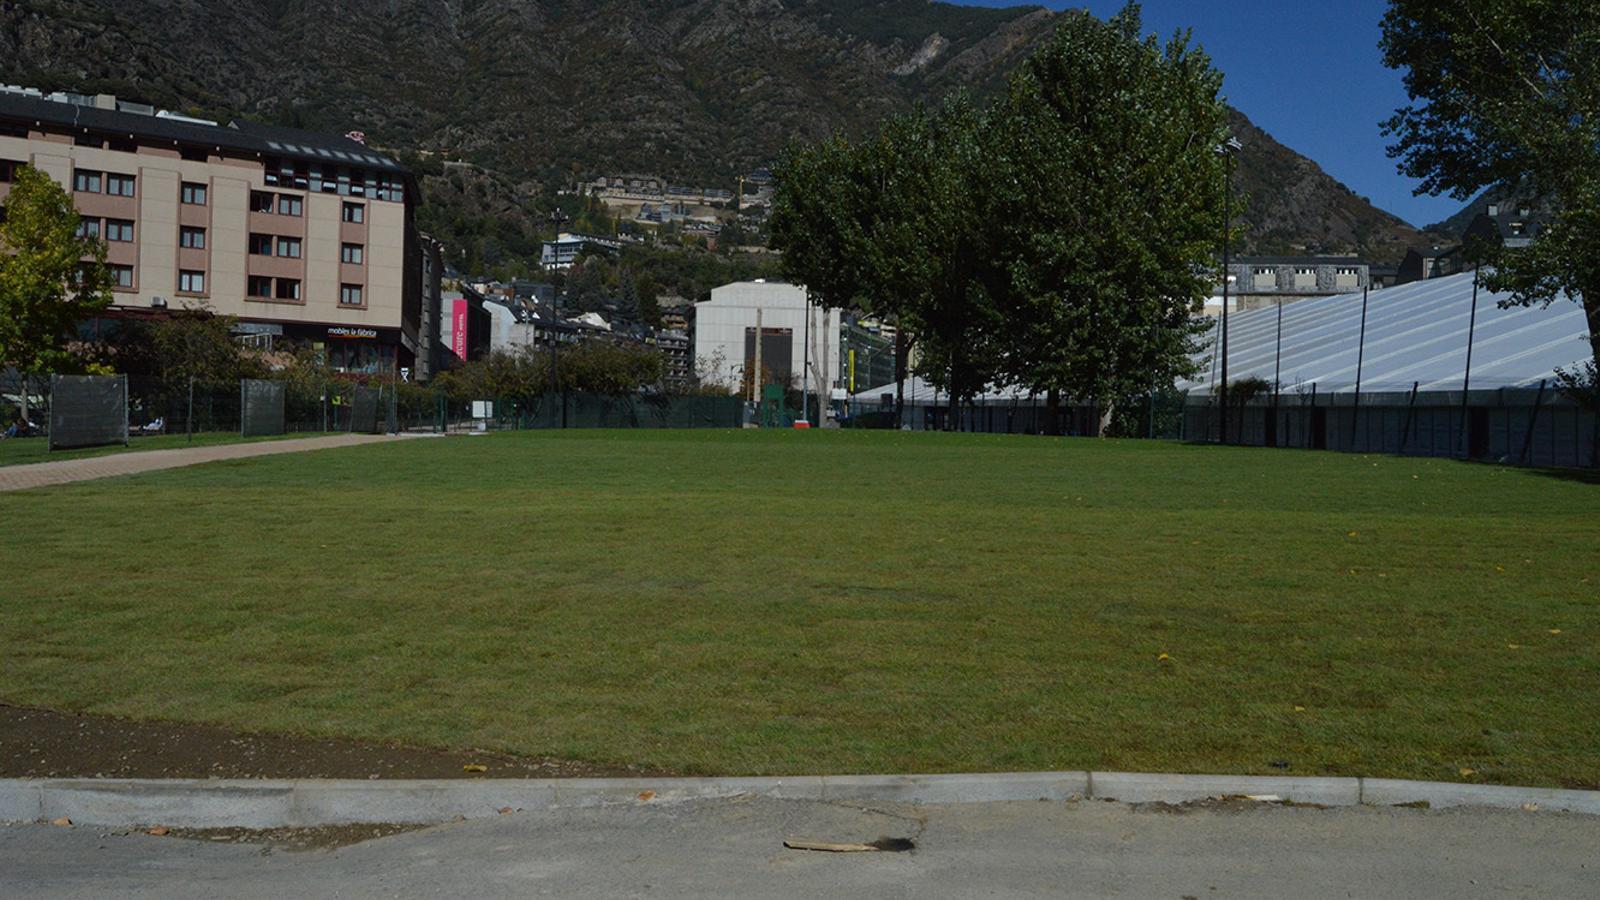 La zona de l''skate park', d'on s'ha retirat ja l'asfalt. / M. F. (ANA)